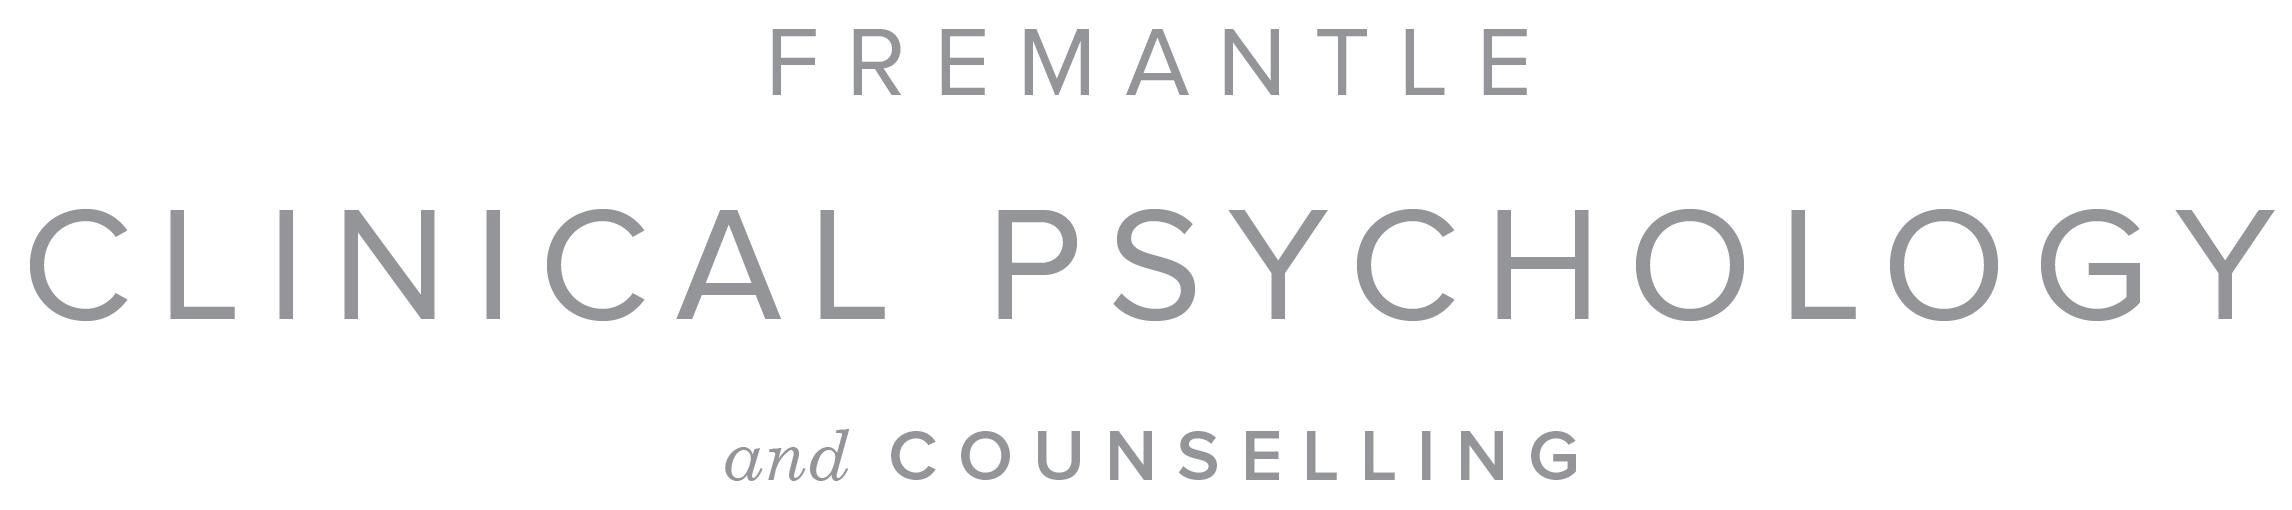 FCPC Final Logo.png